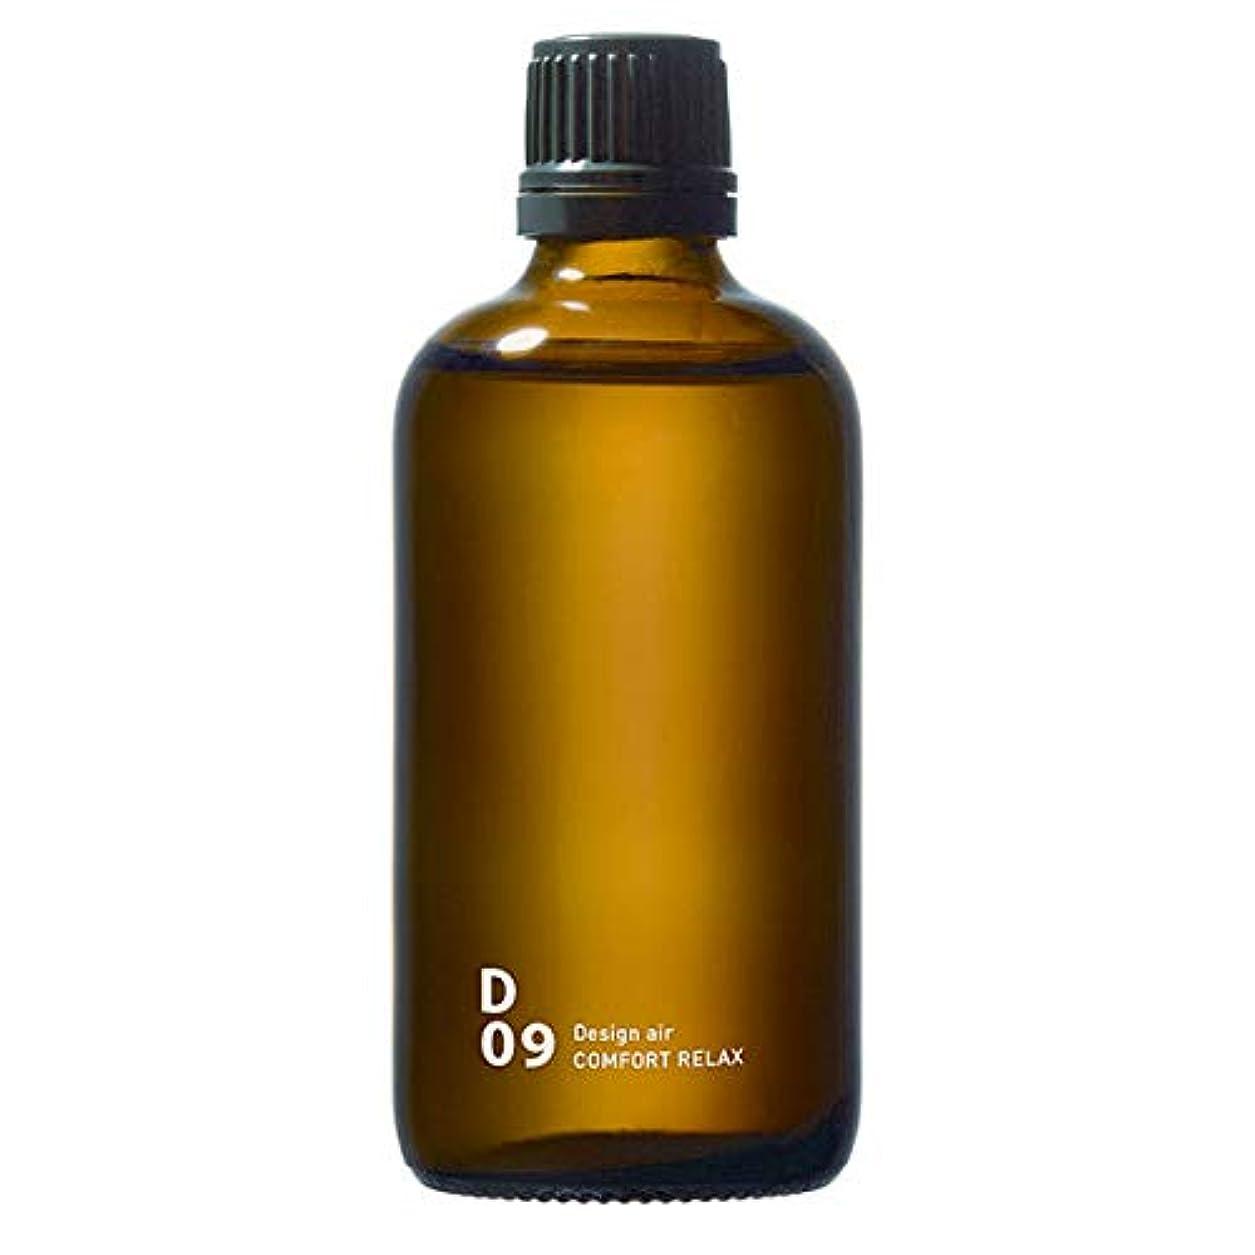 D09 COMFORT RELAX piezo aroma oil 100ml